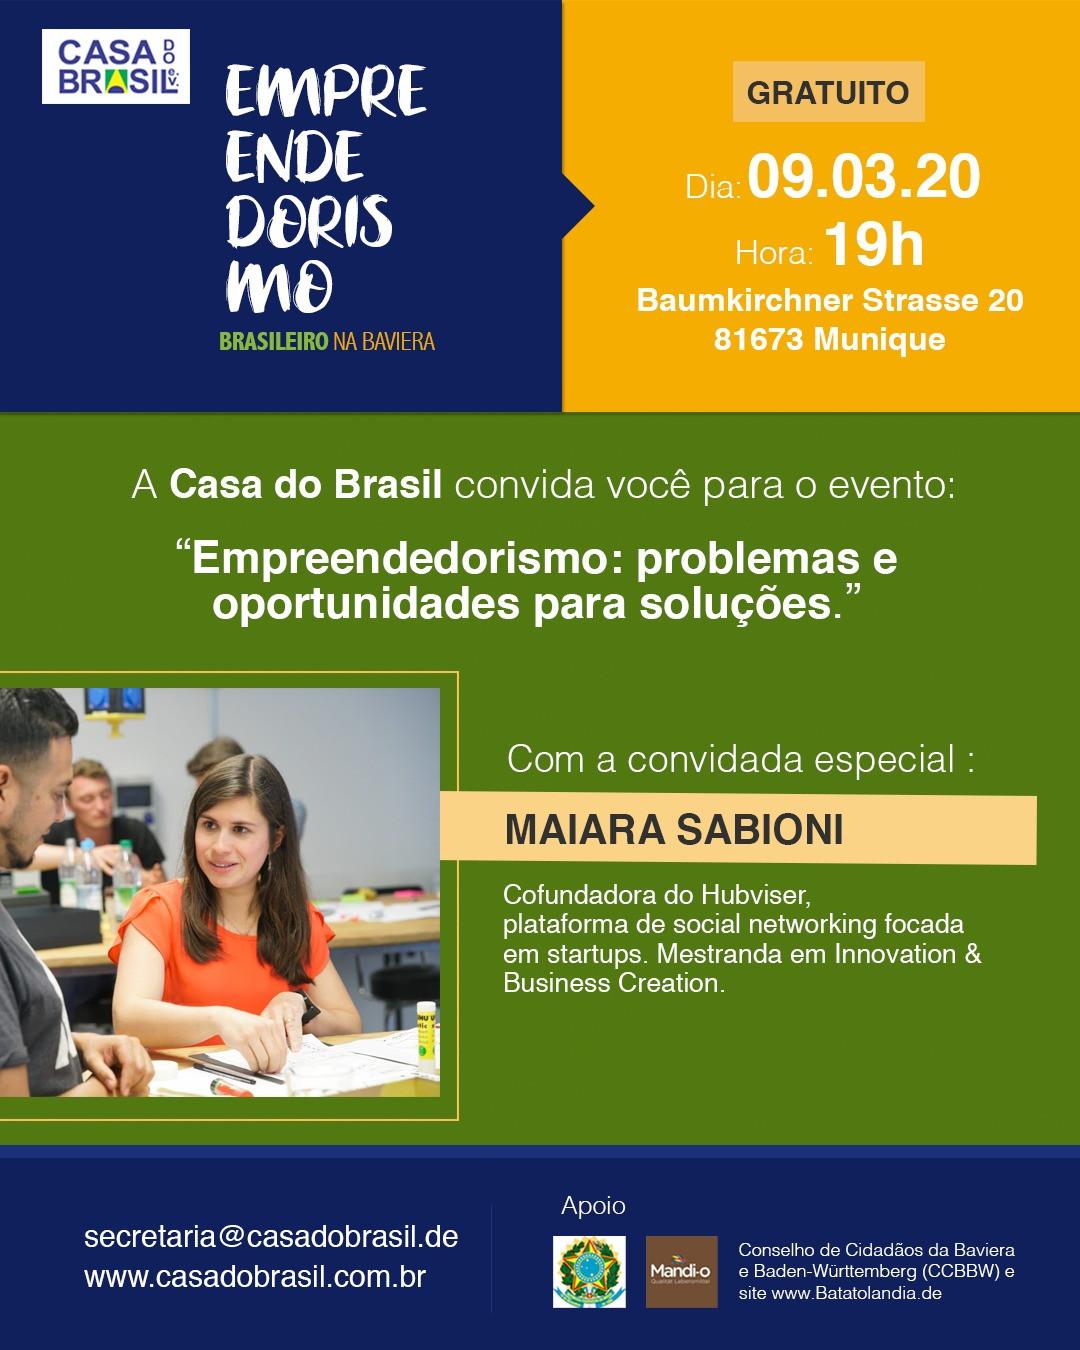 empreendedorismo-brasileiro-na-baviera-maiara-sabioni